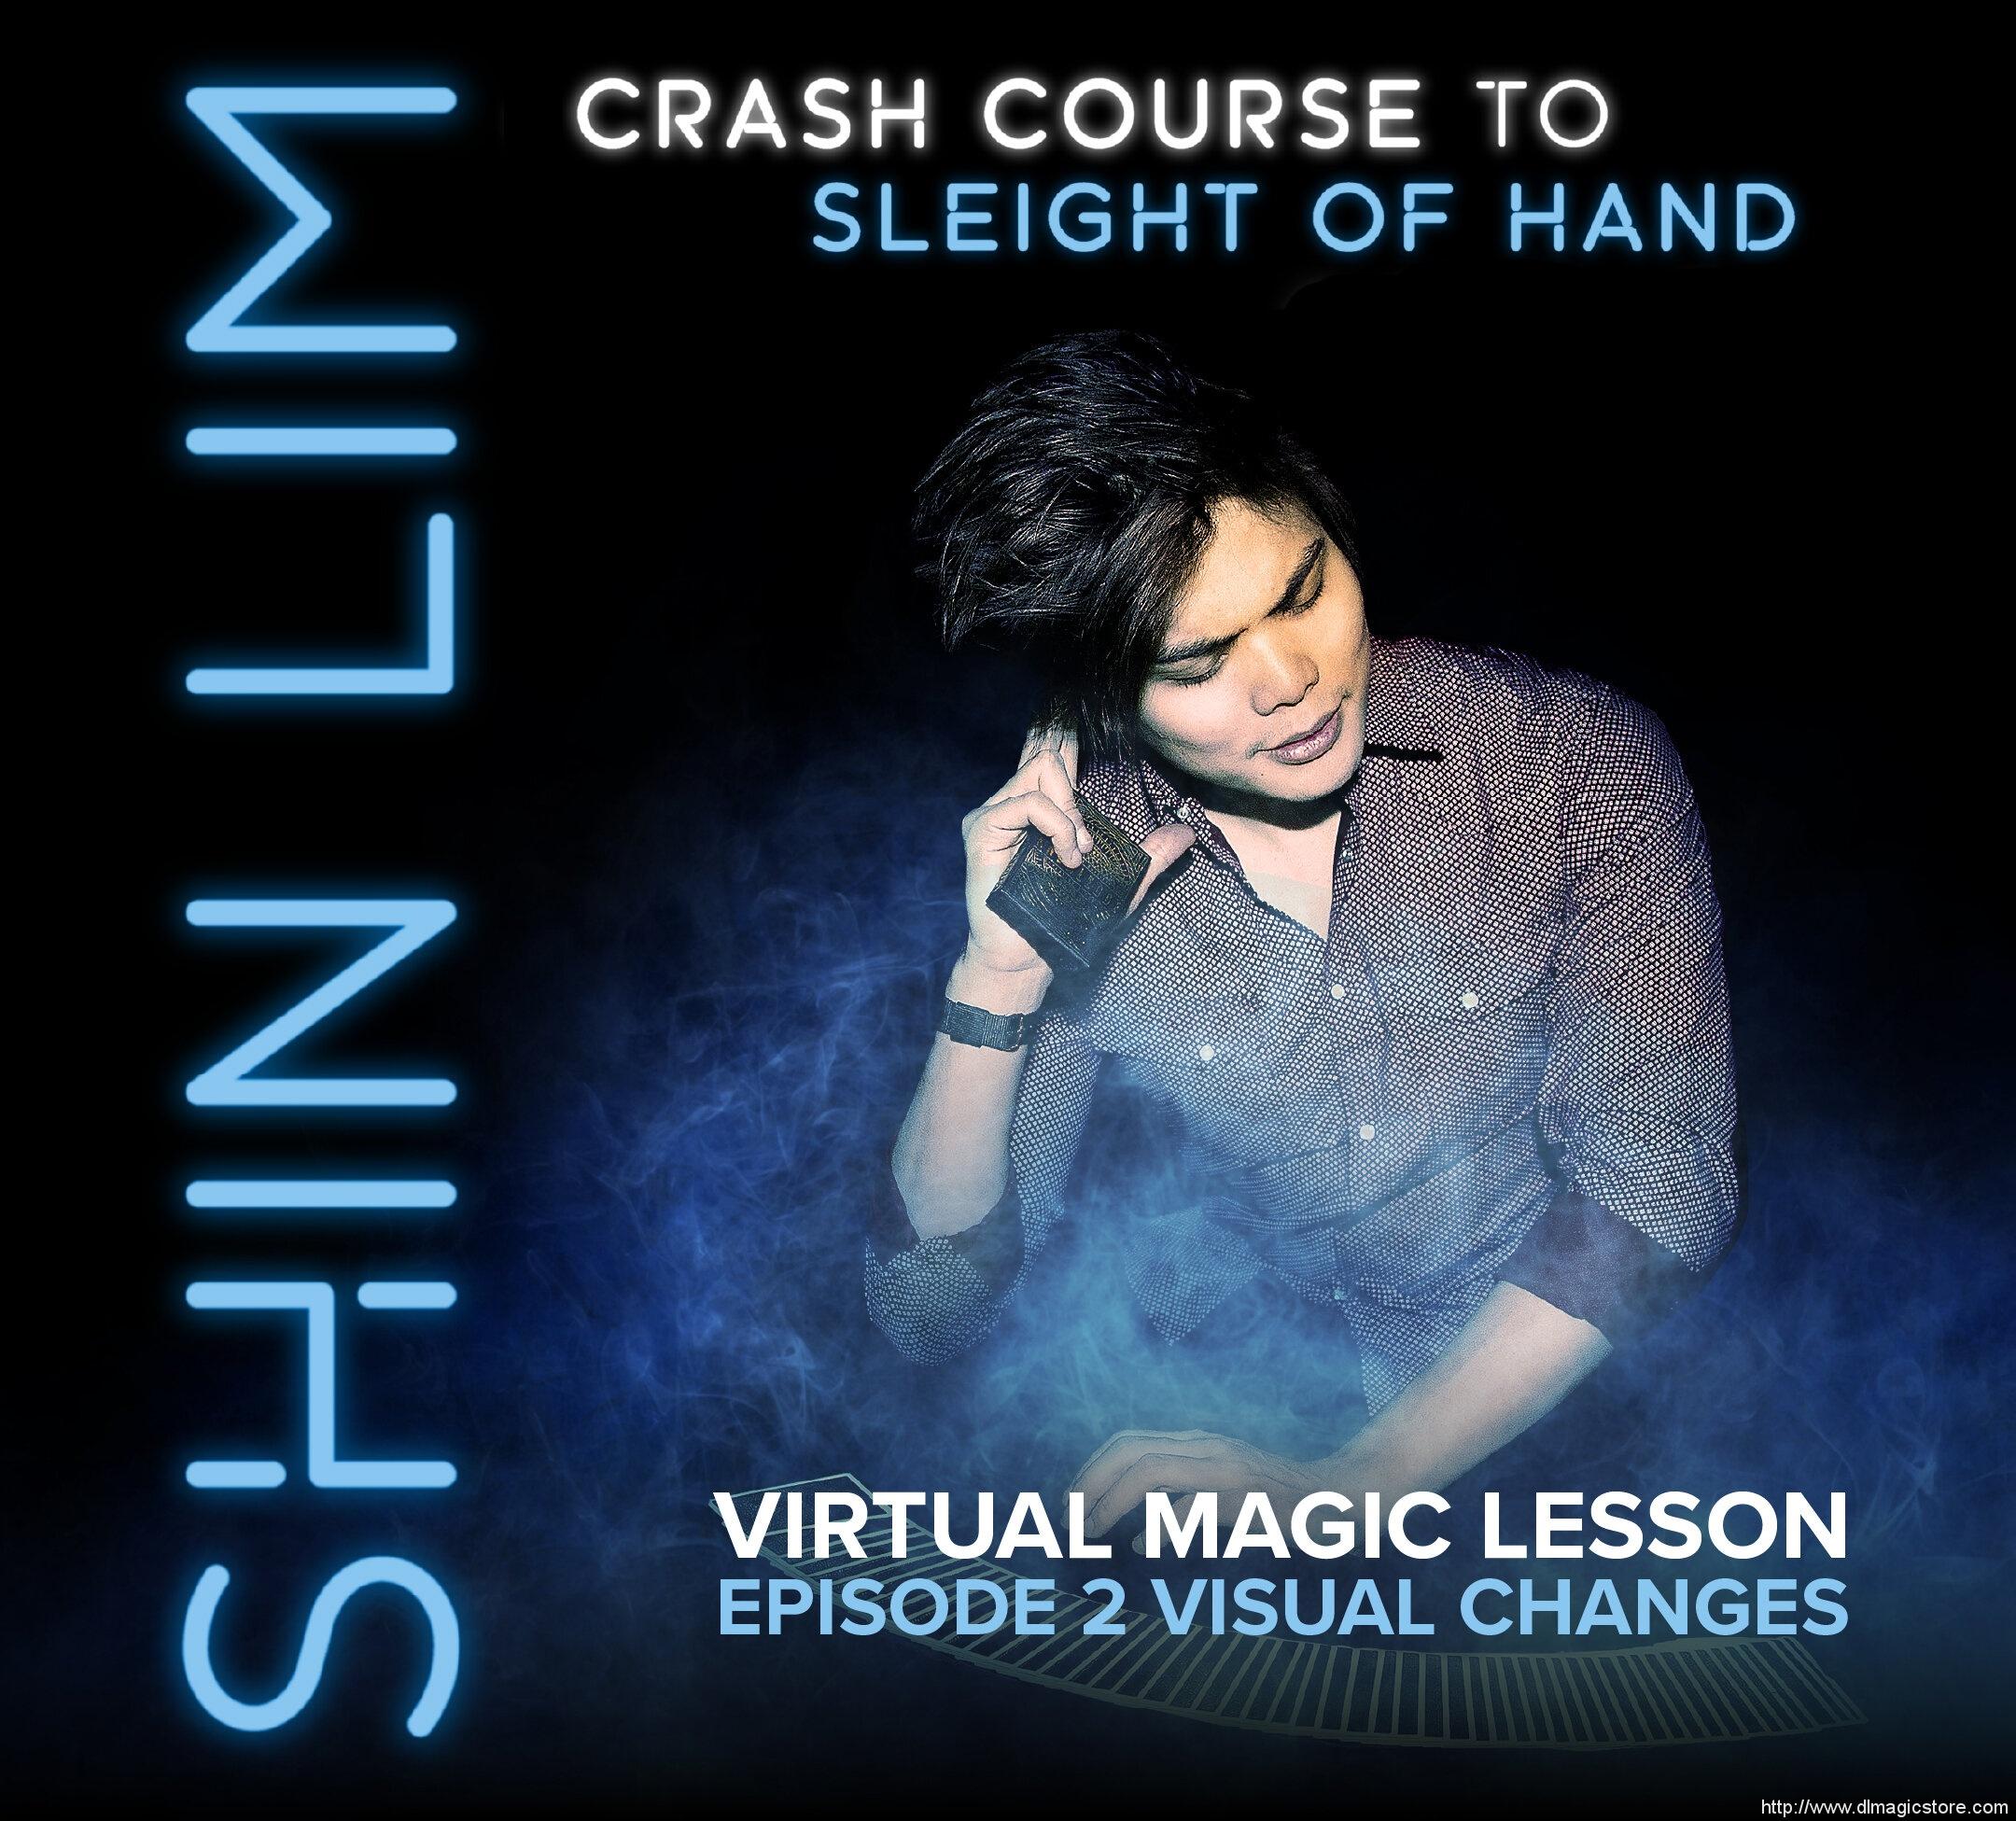 Crash Course Ep 2 Visual Change by Shin lim